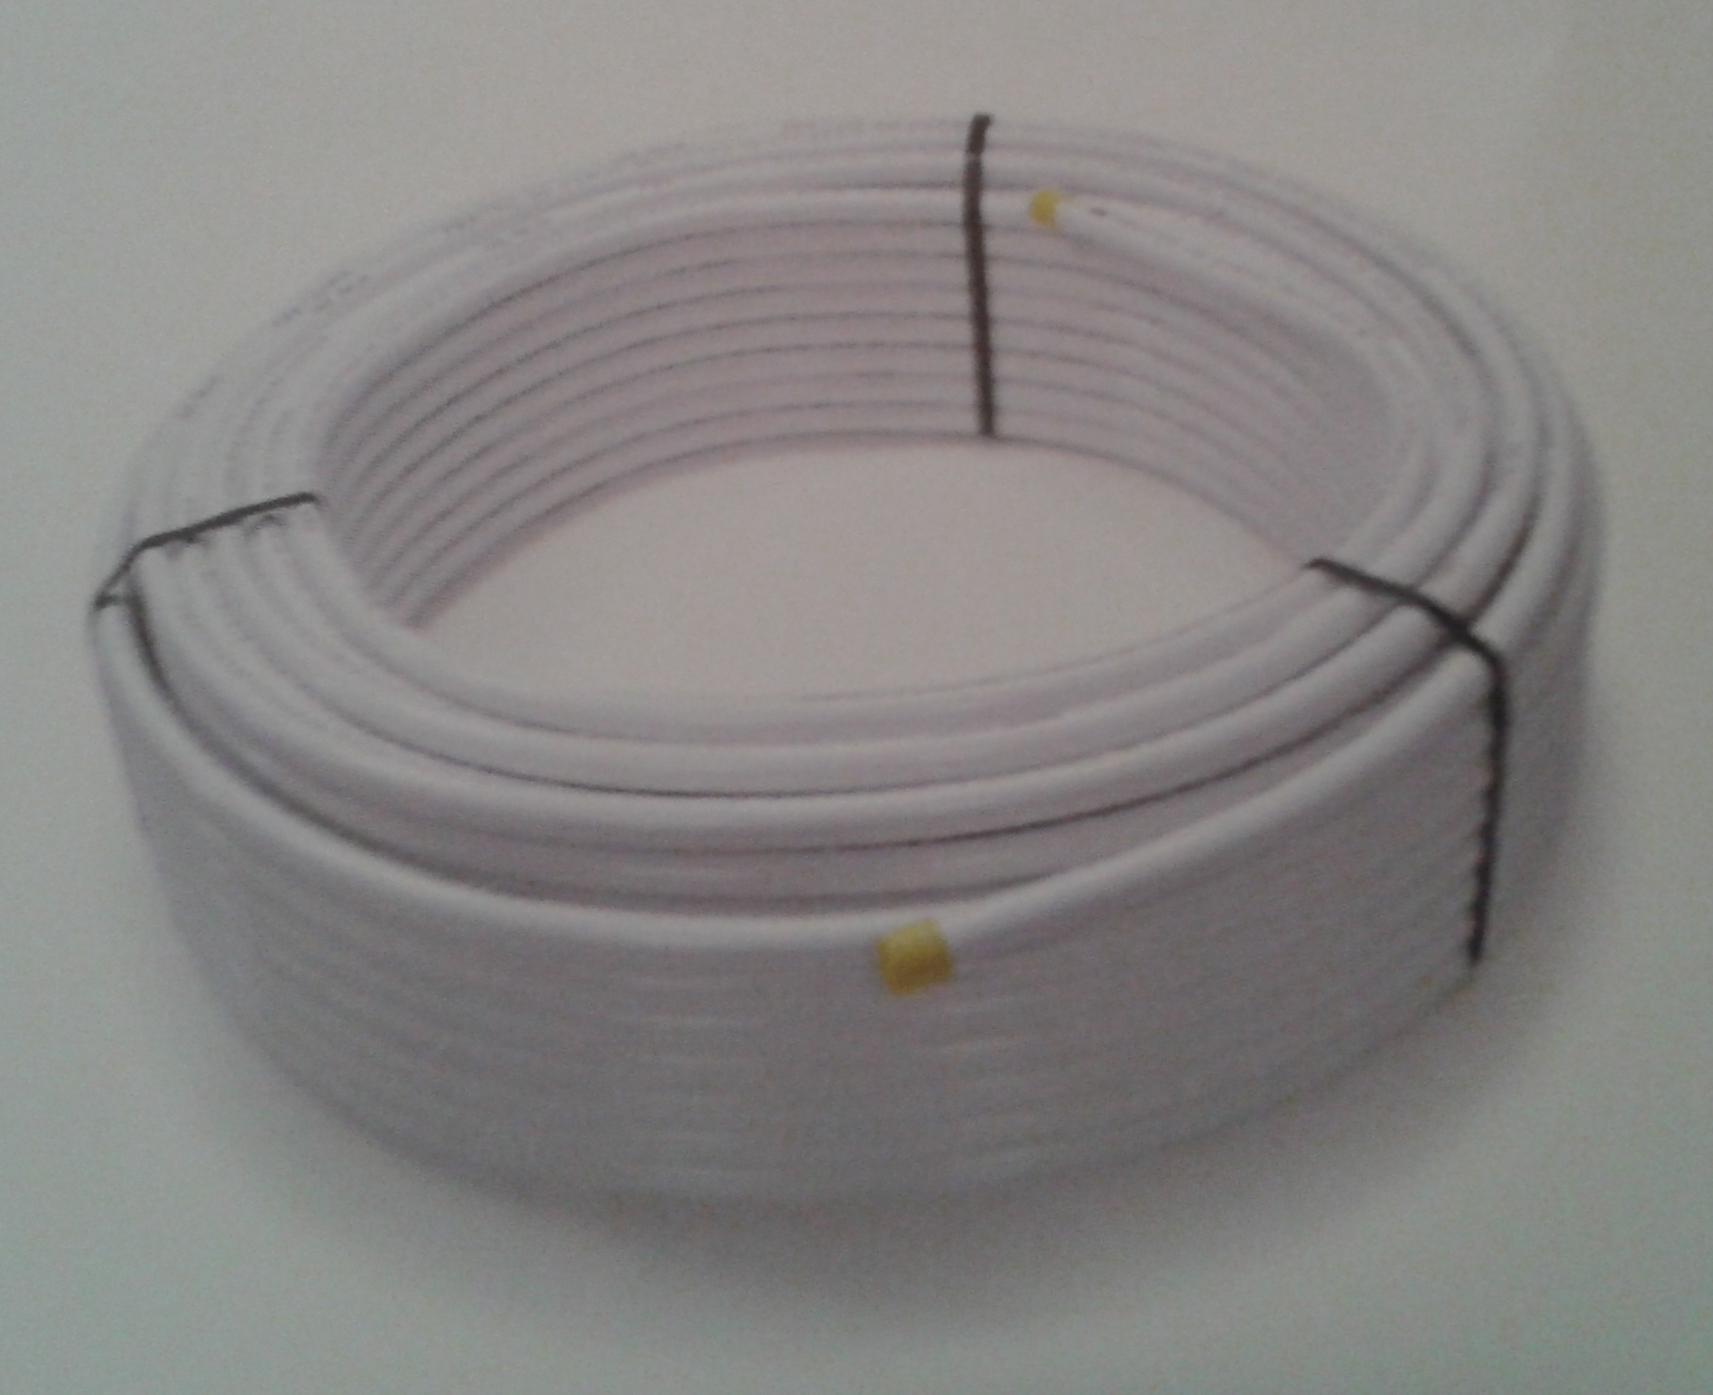 Aluminium Mehrschichtverbundrohr lfd.Meter 20x2mm für Heizung Sanitär €6,14//m